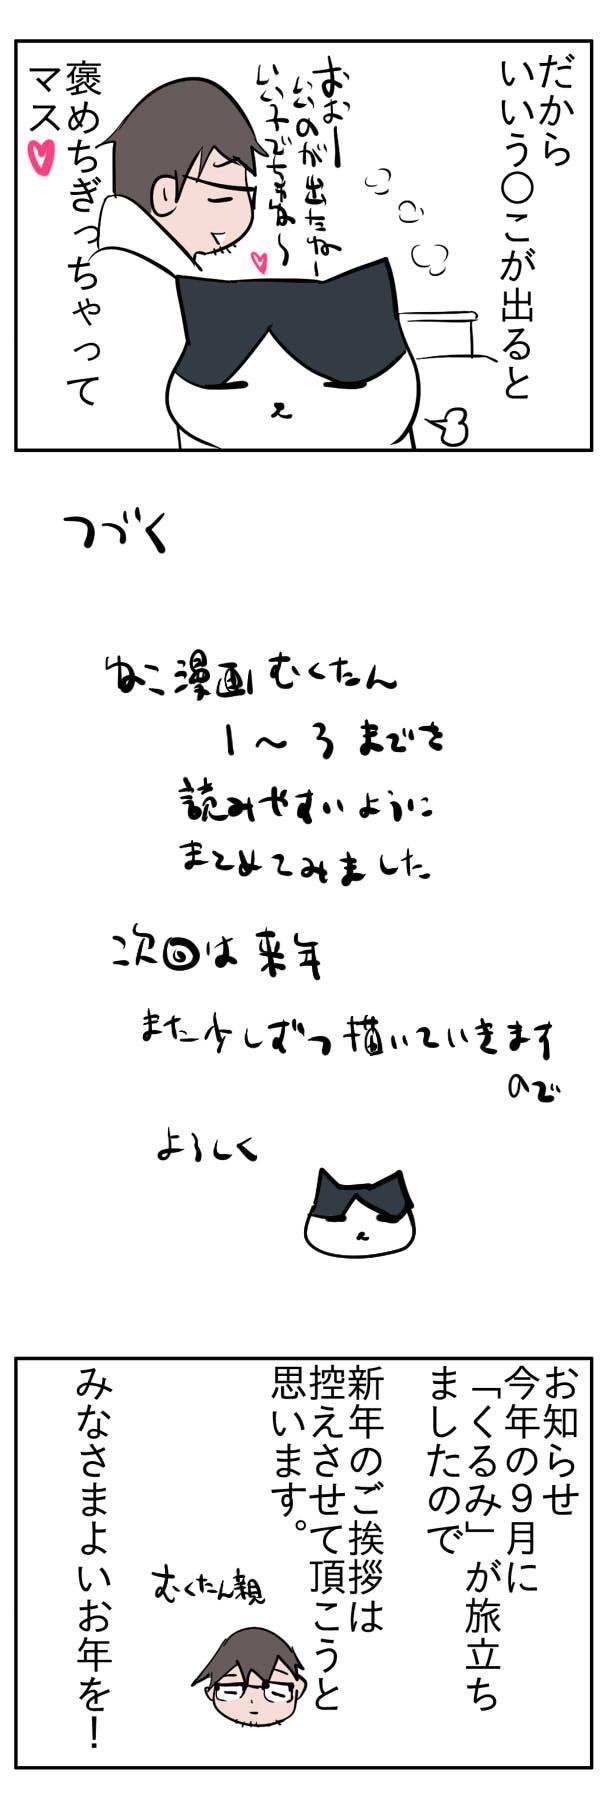 2014 12 27 4